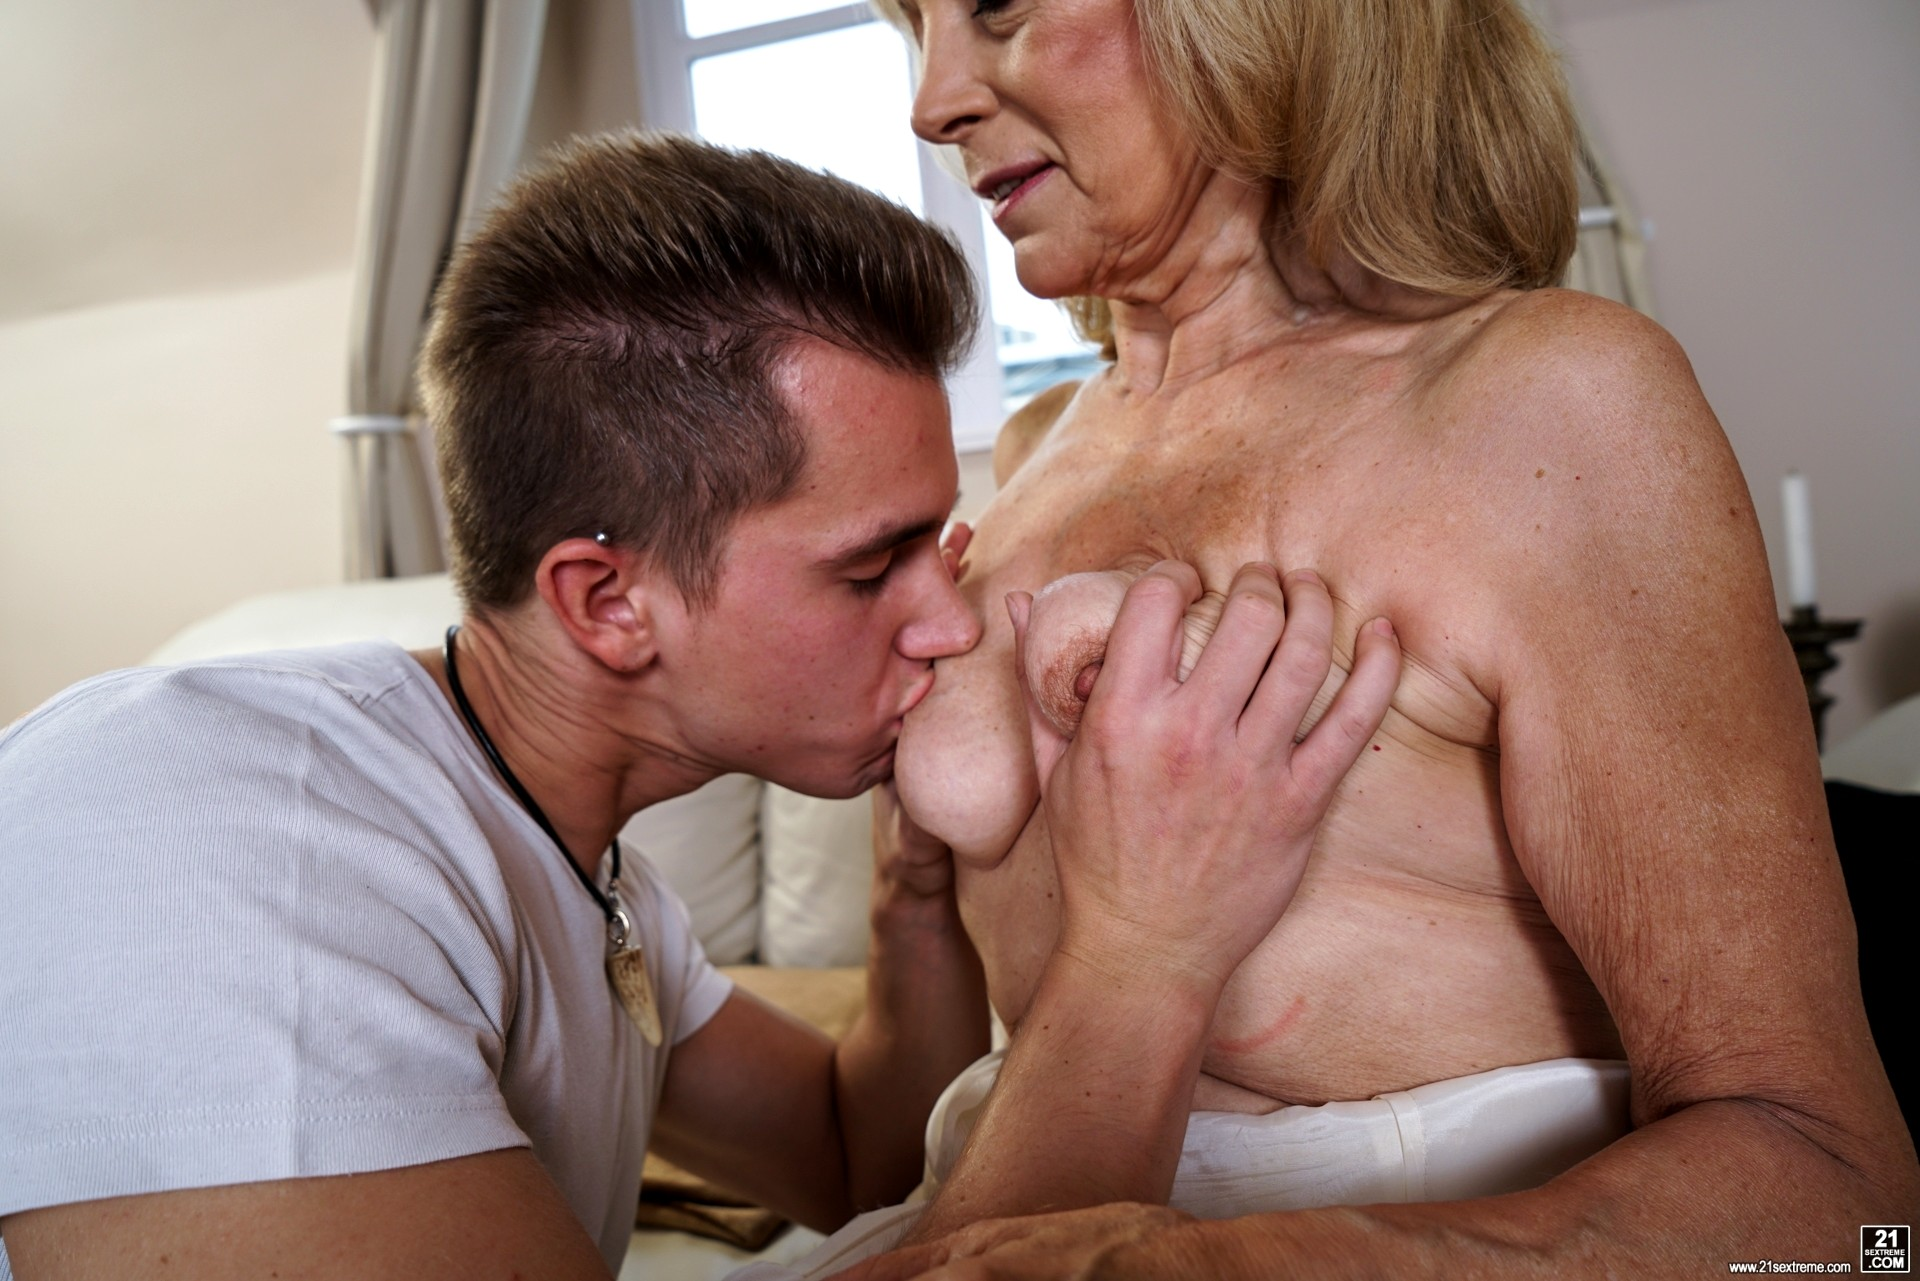 Babe Today 21 Sextury Szuzanne International Granny -5566